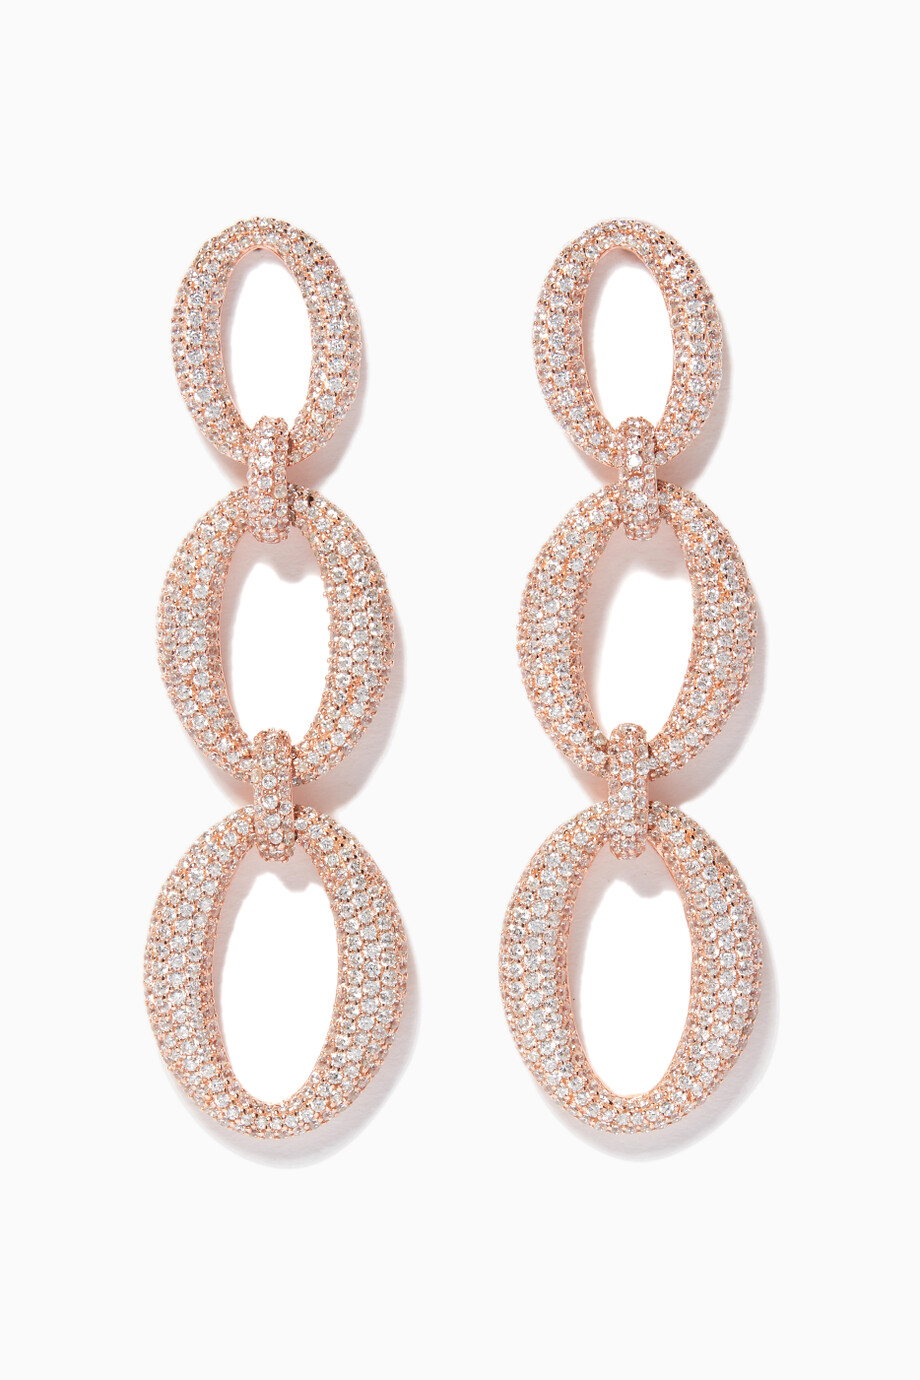 9828bbedd84 Shop KHAILO SILVER Neutral Rose Gold Embellished Drop Earrings for Women